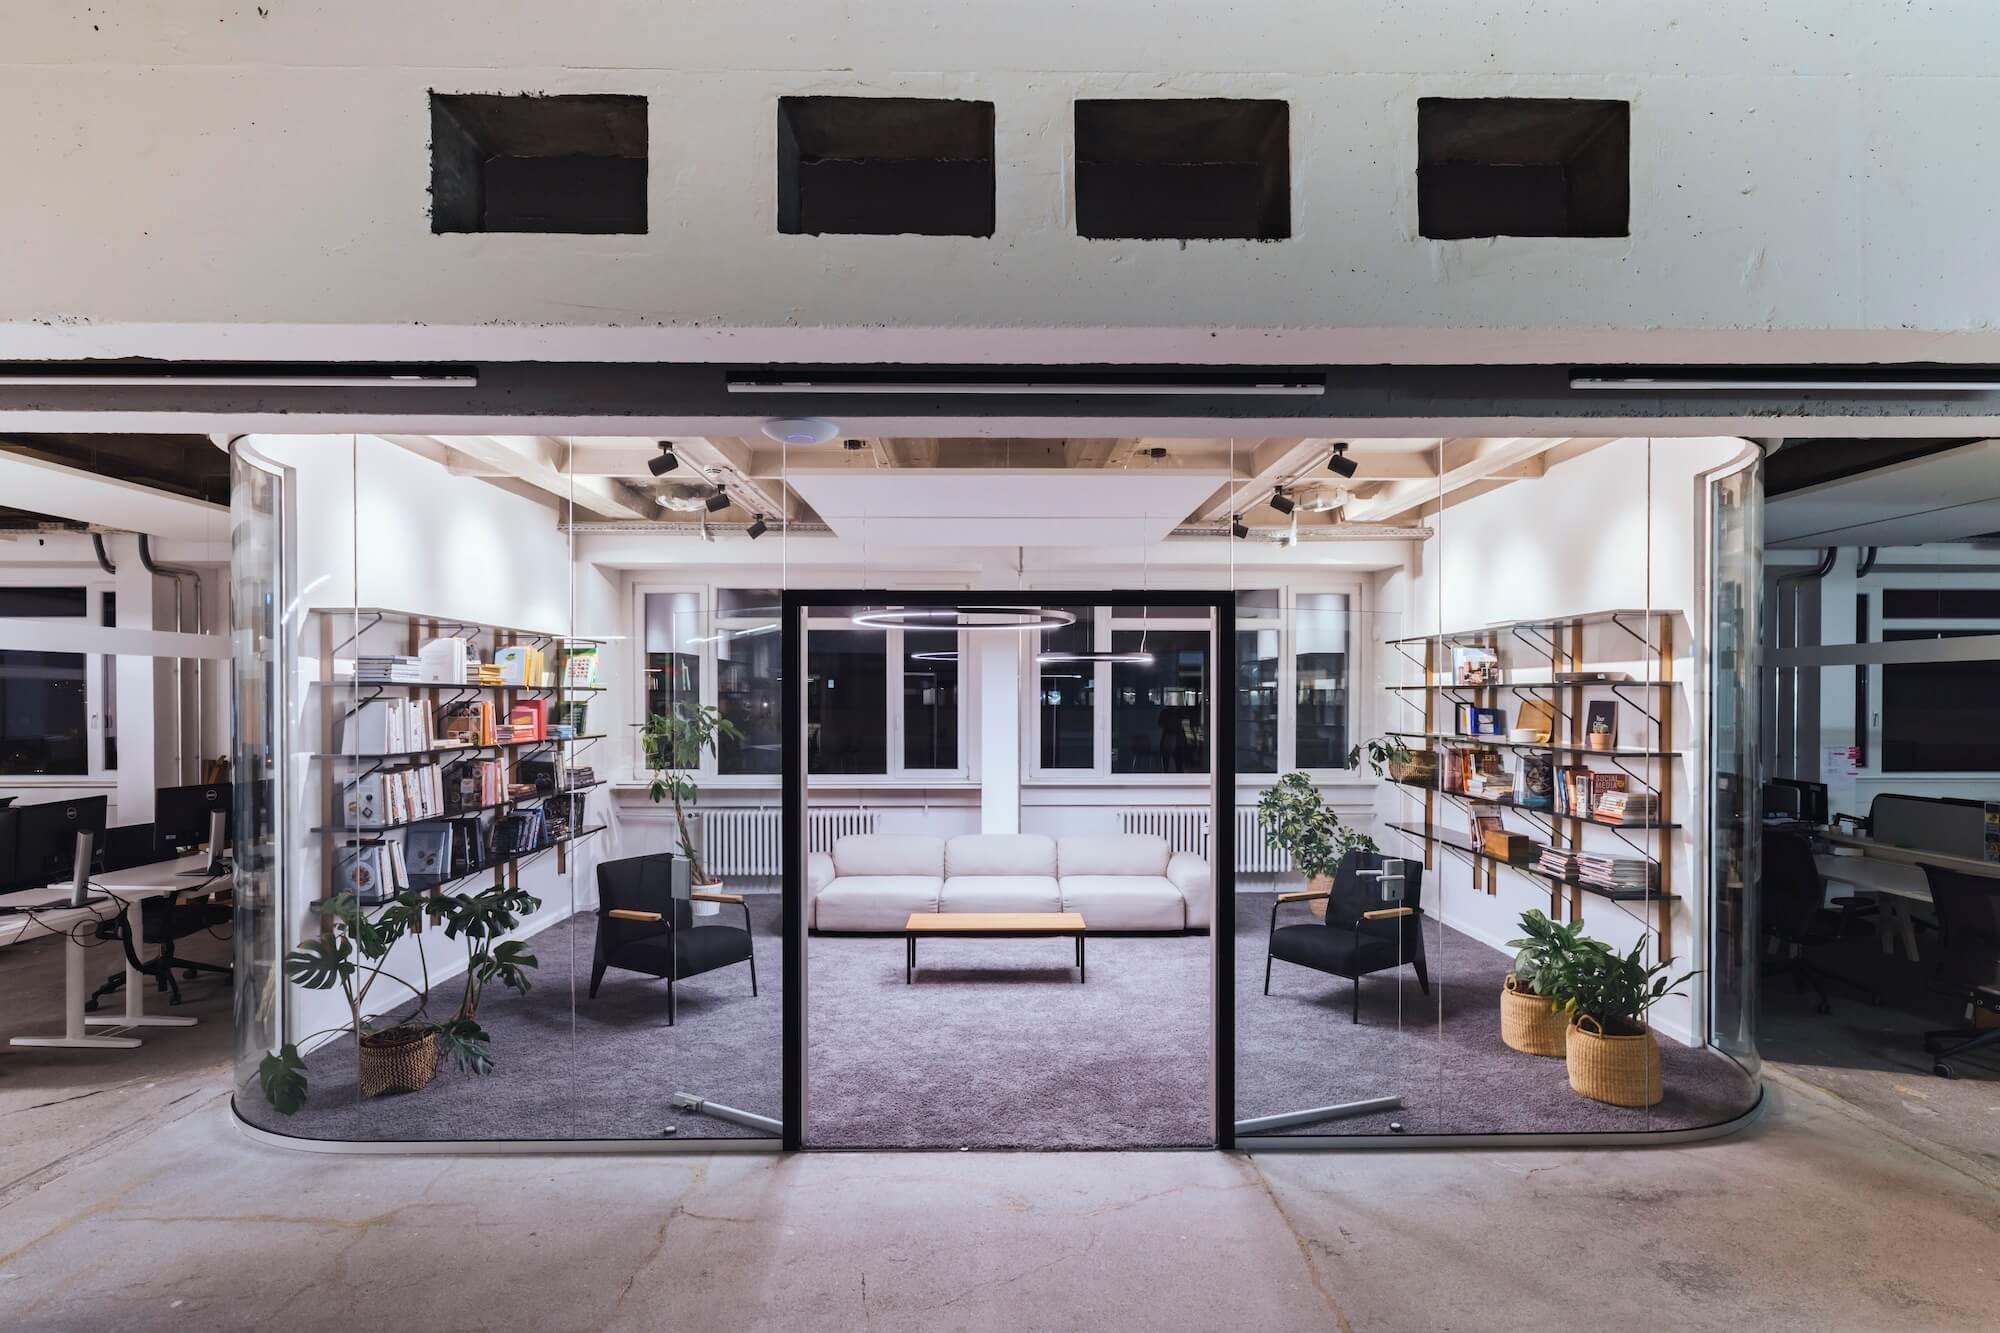 Open Space Büro Startup Kitchen Stories Architekturbüro TKEZ Bibliothek bei Nacht